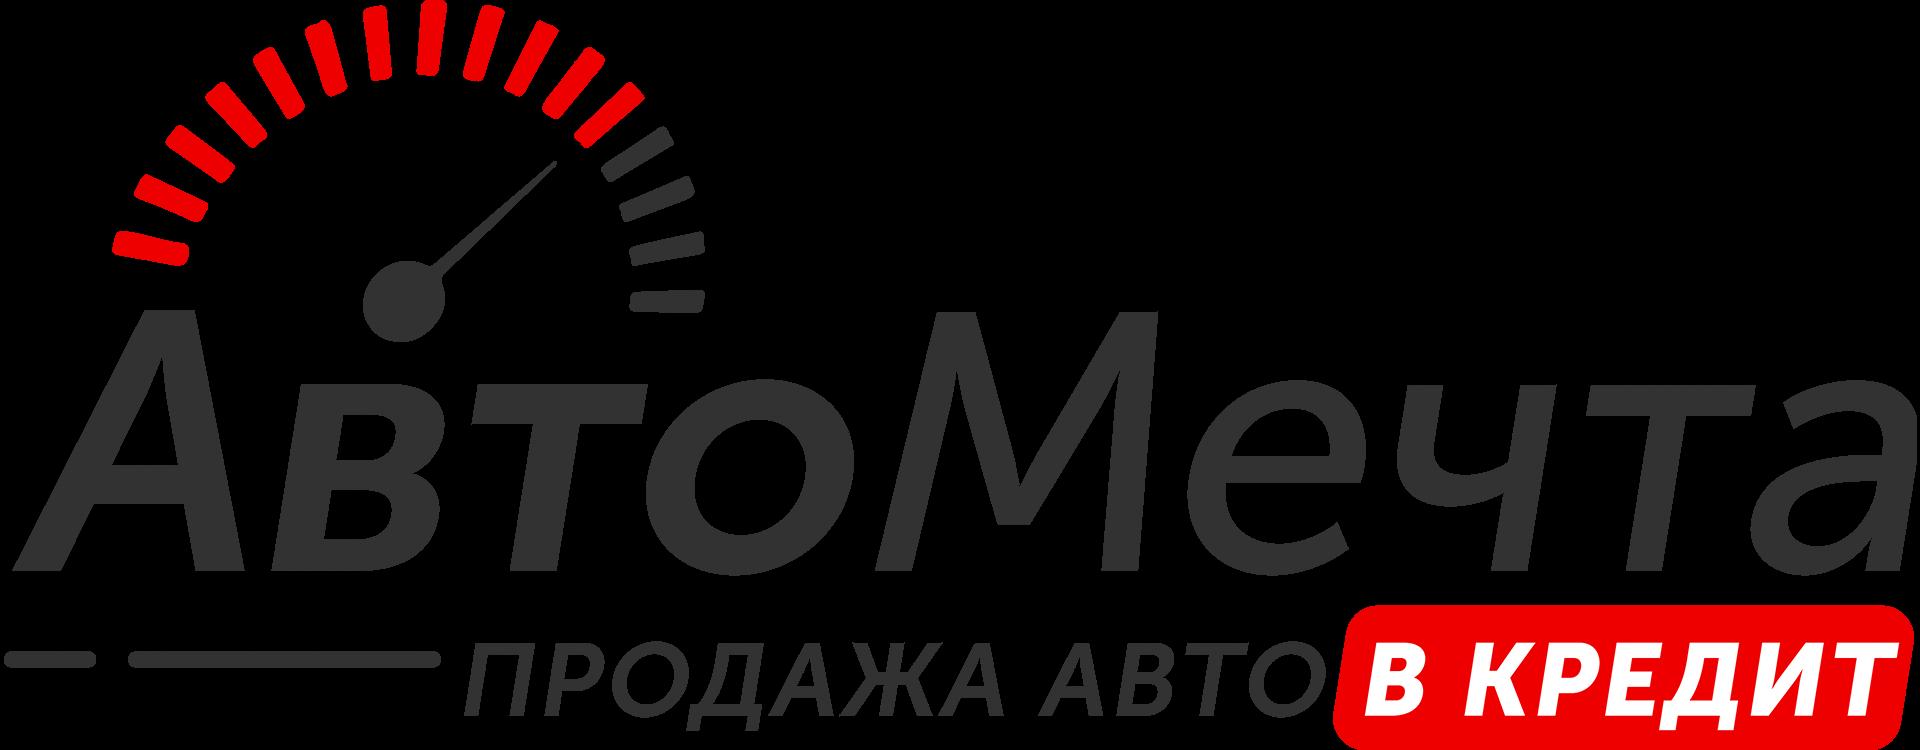 займ на яндекс деньги skip-start.ru